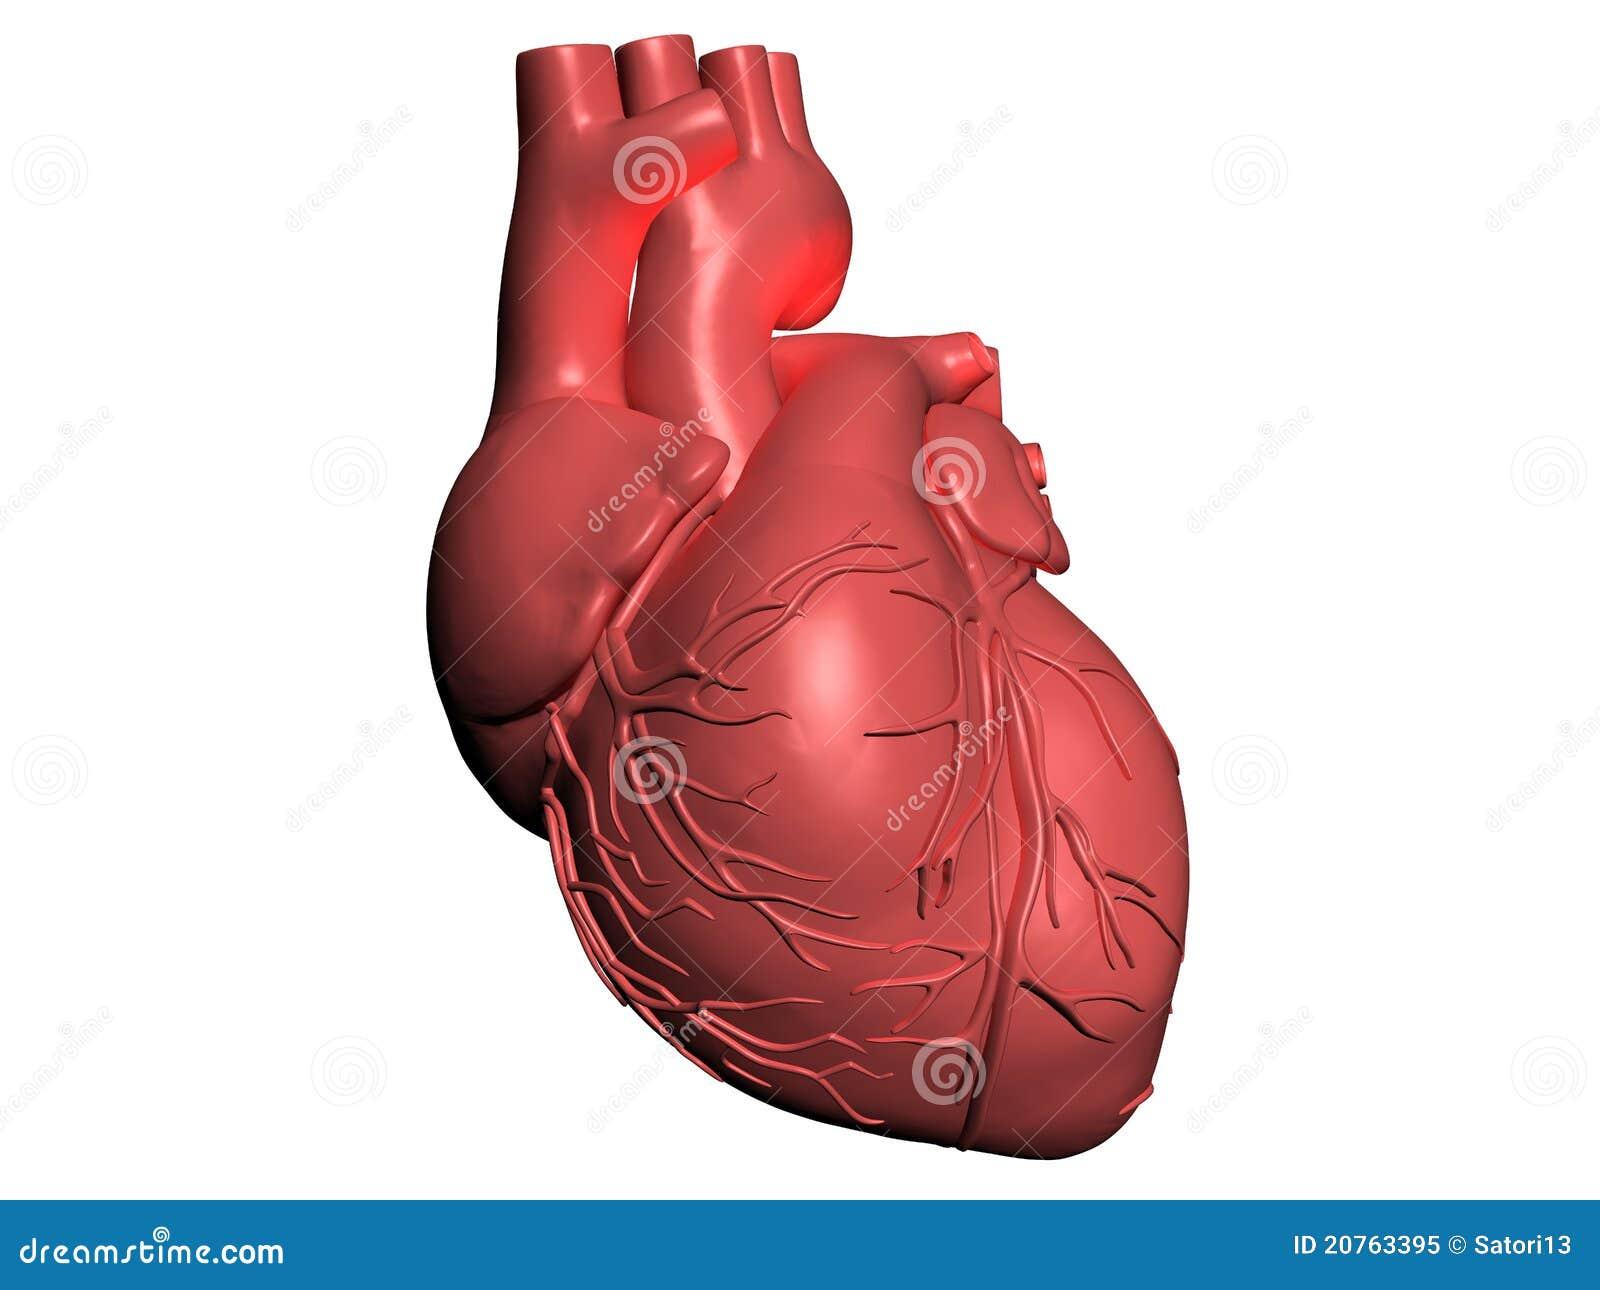 Heart, heart, heart, heart, heart, heart, heart, heart~